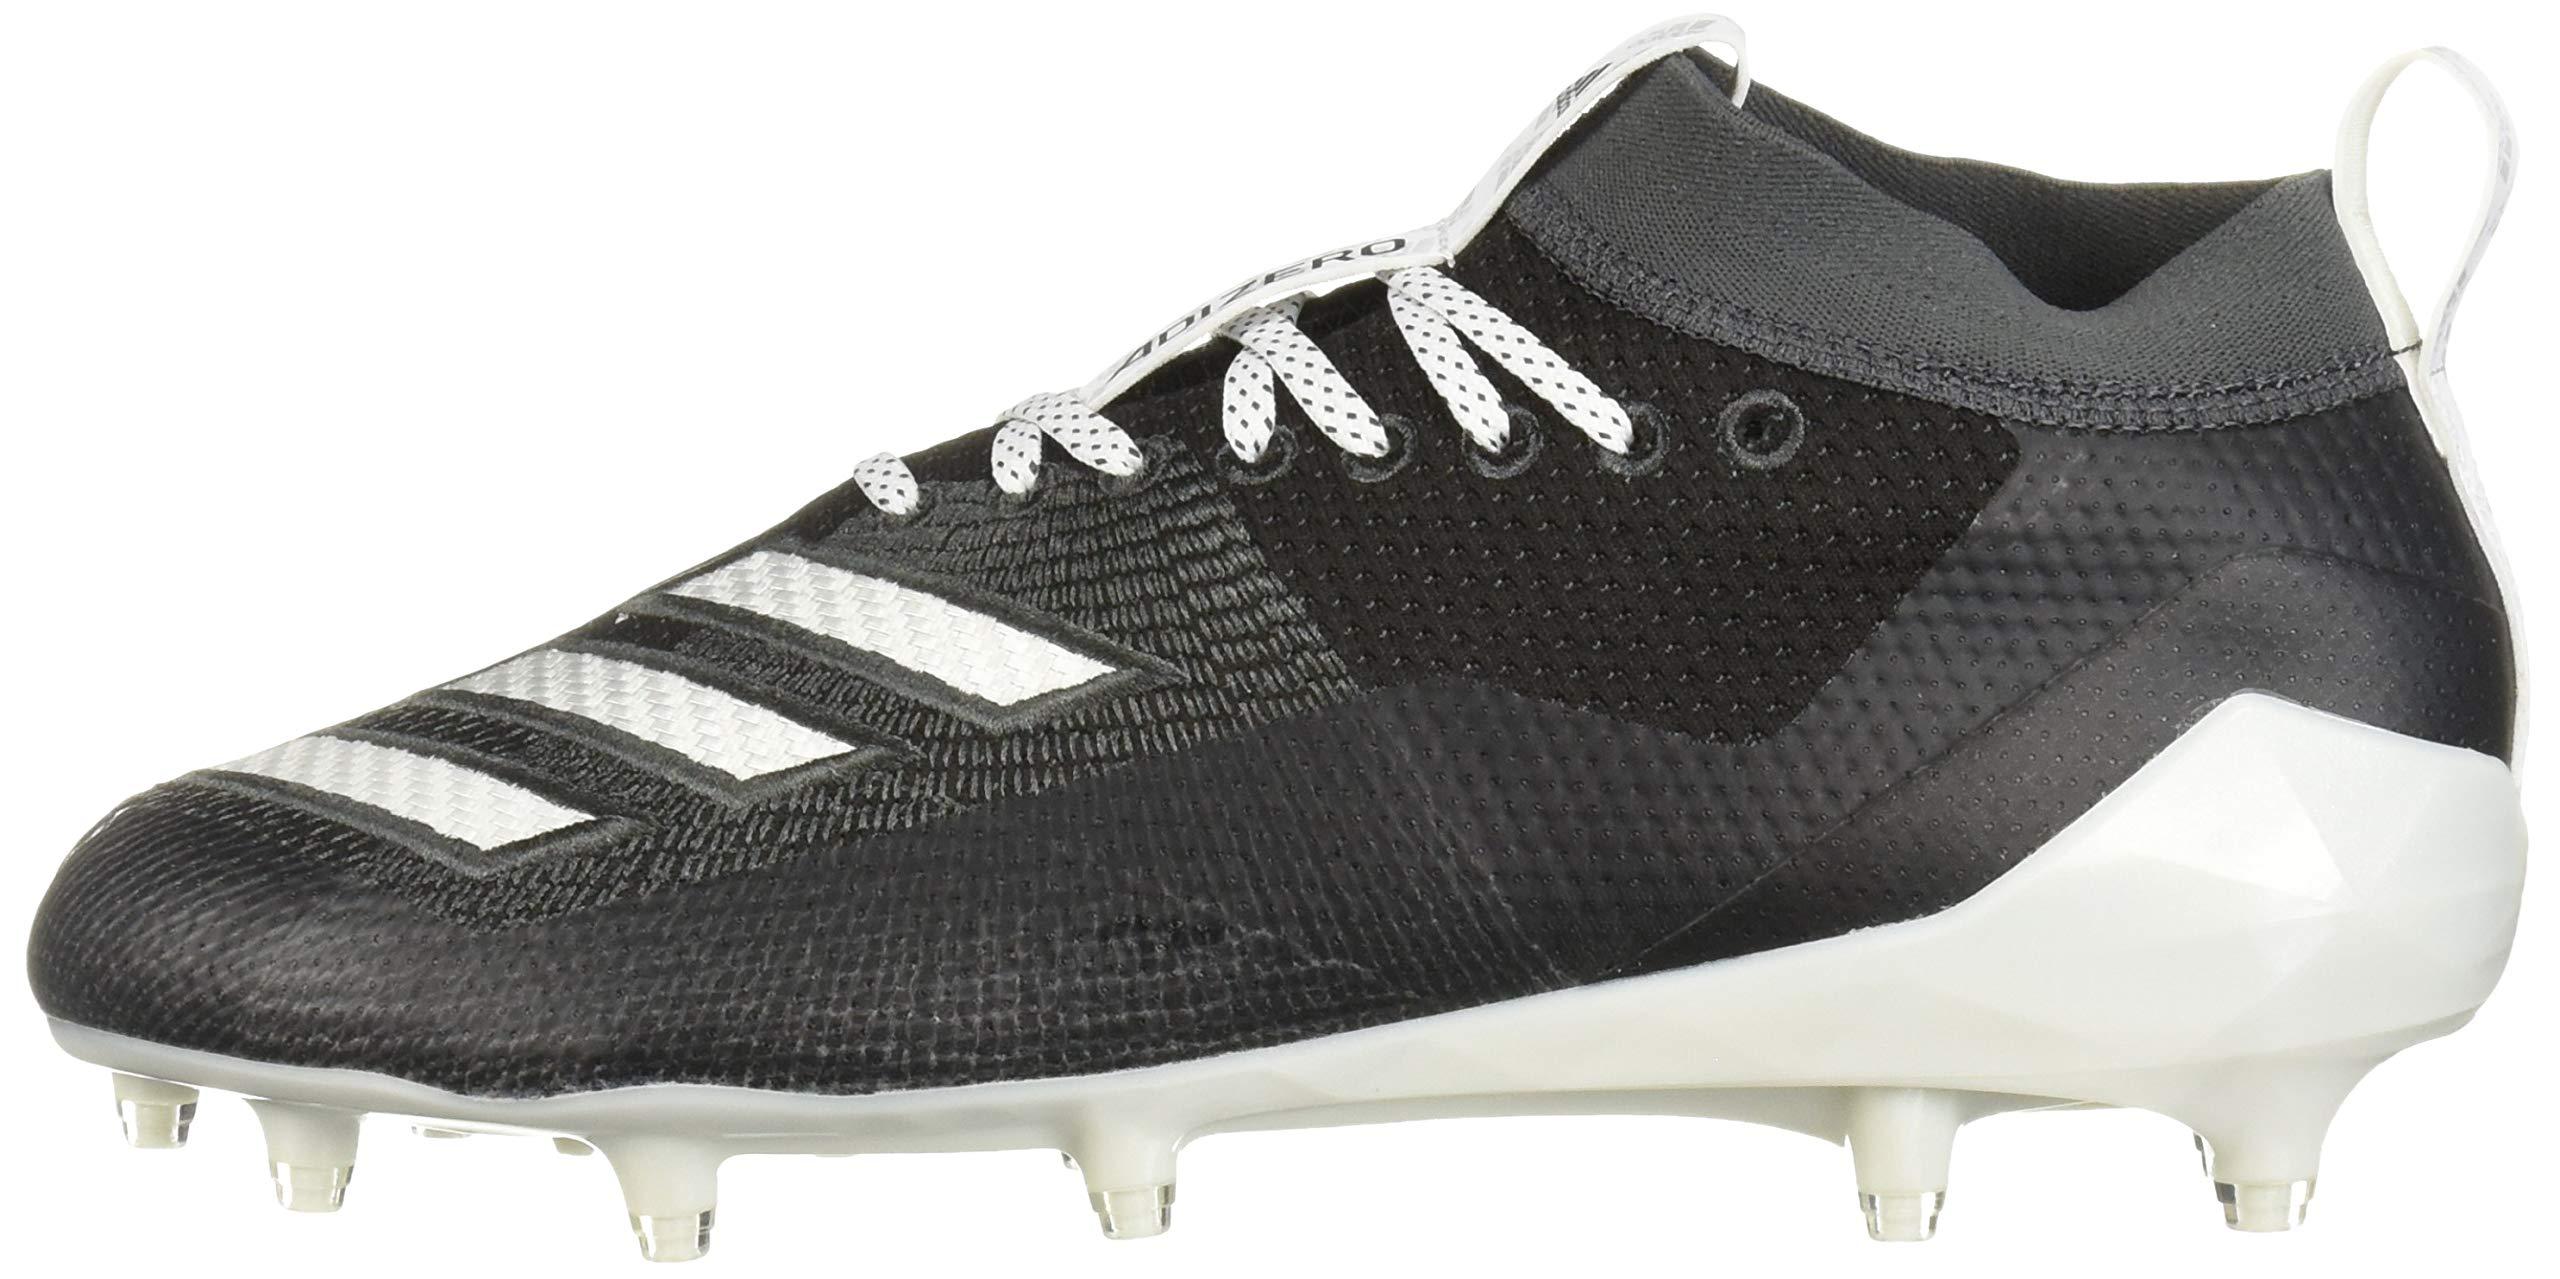 adidas Men's Adizero 8.0 Football Shoe Black/White/Grey 6.5 M US by adidas (Image #5)